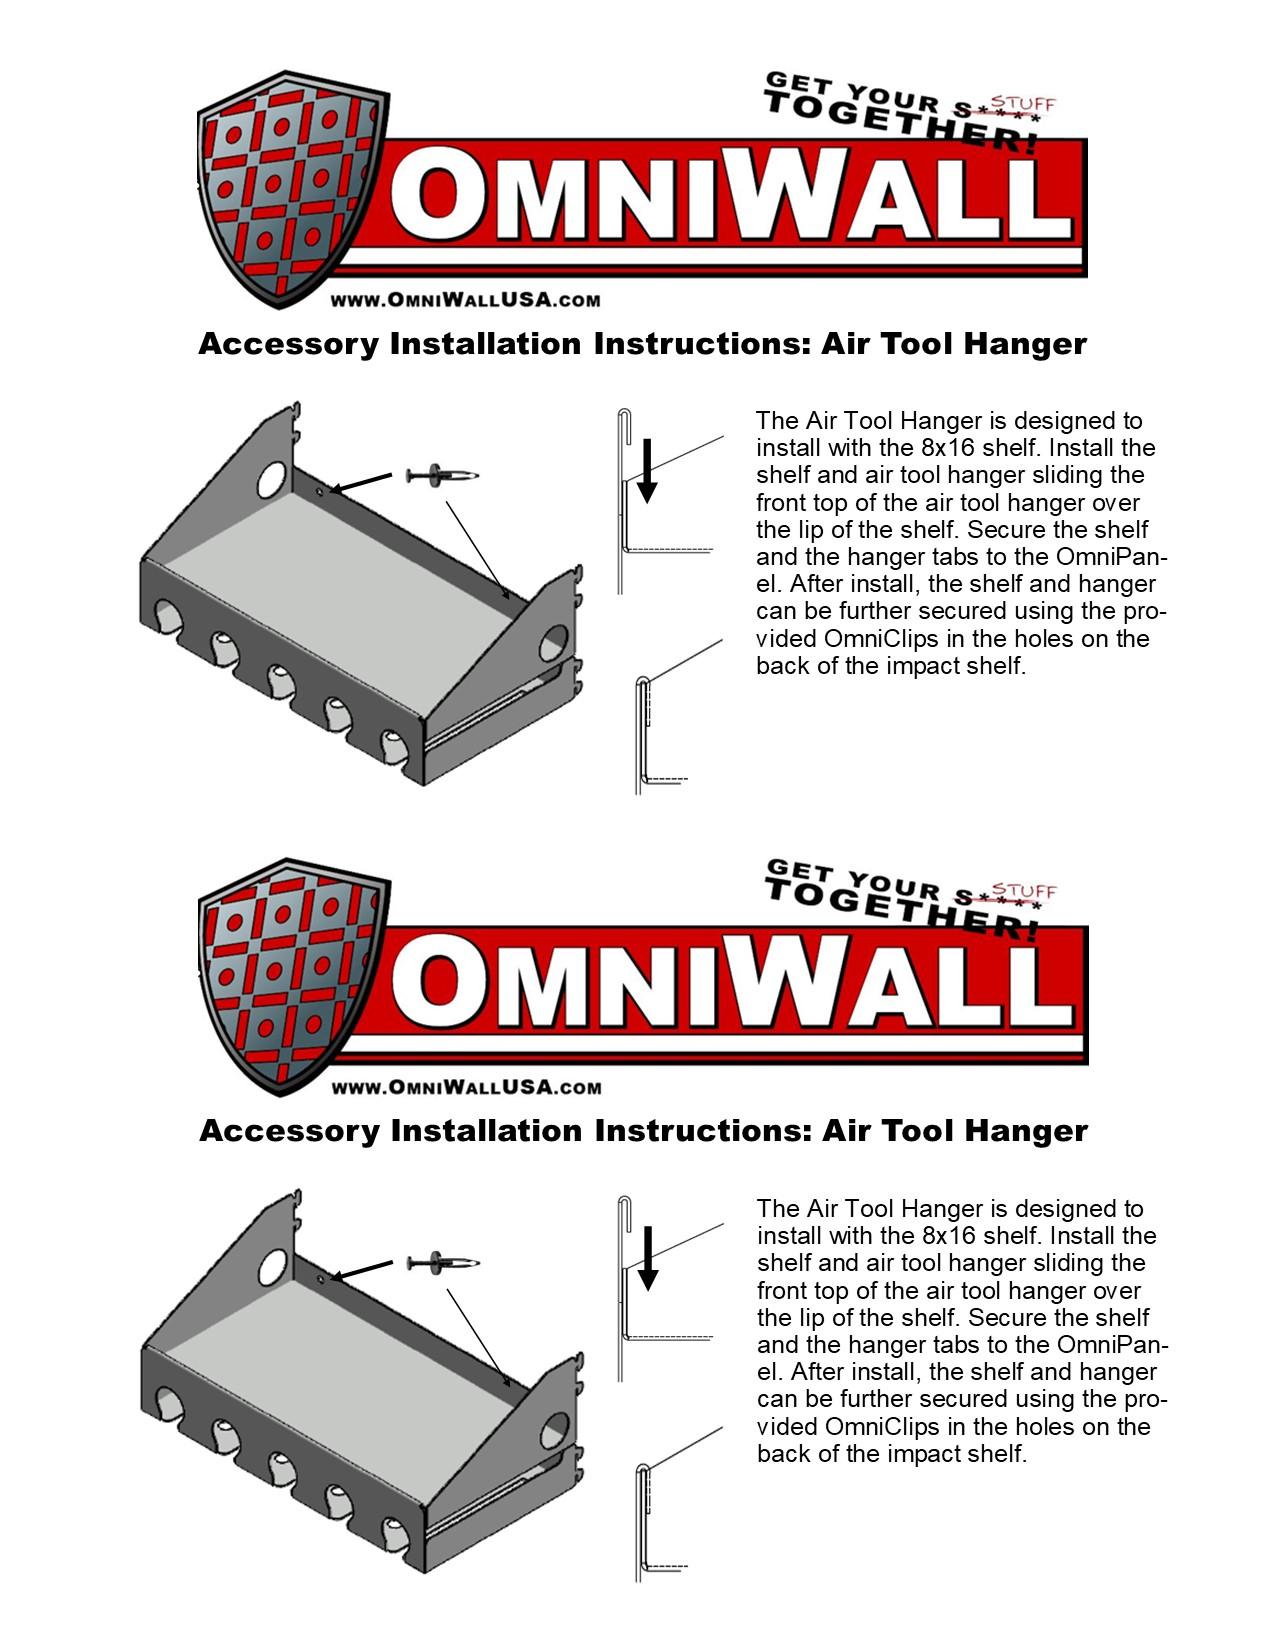 accessory-installation-instructions-air-tool.jpg